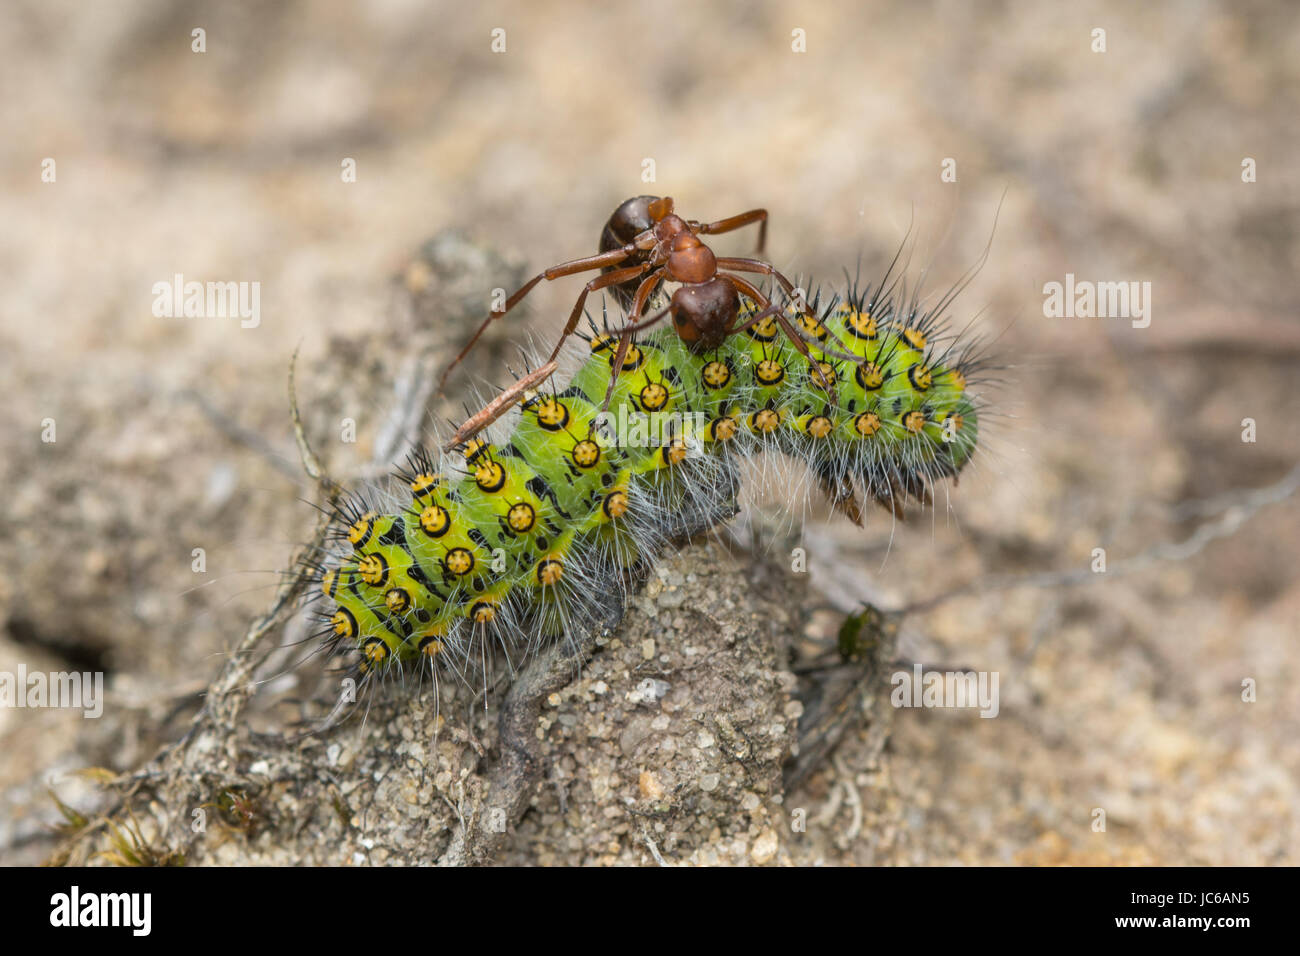 close-up-of-emperor-moth-saturnia-pavonia-caterpillar-or-larva-being-JC6AN5.jpg